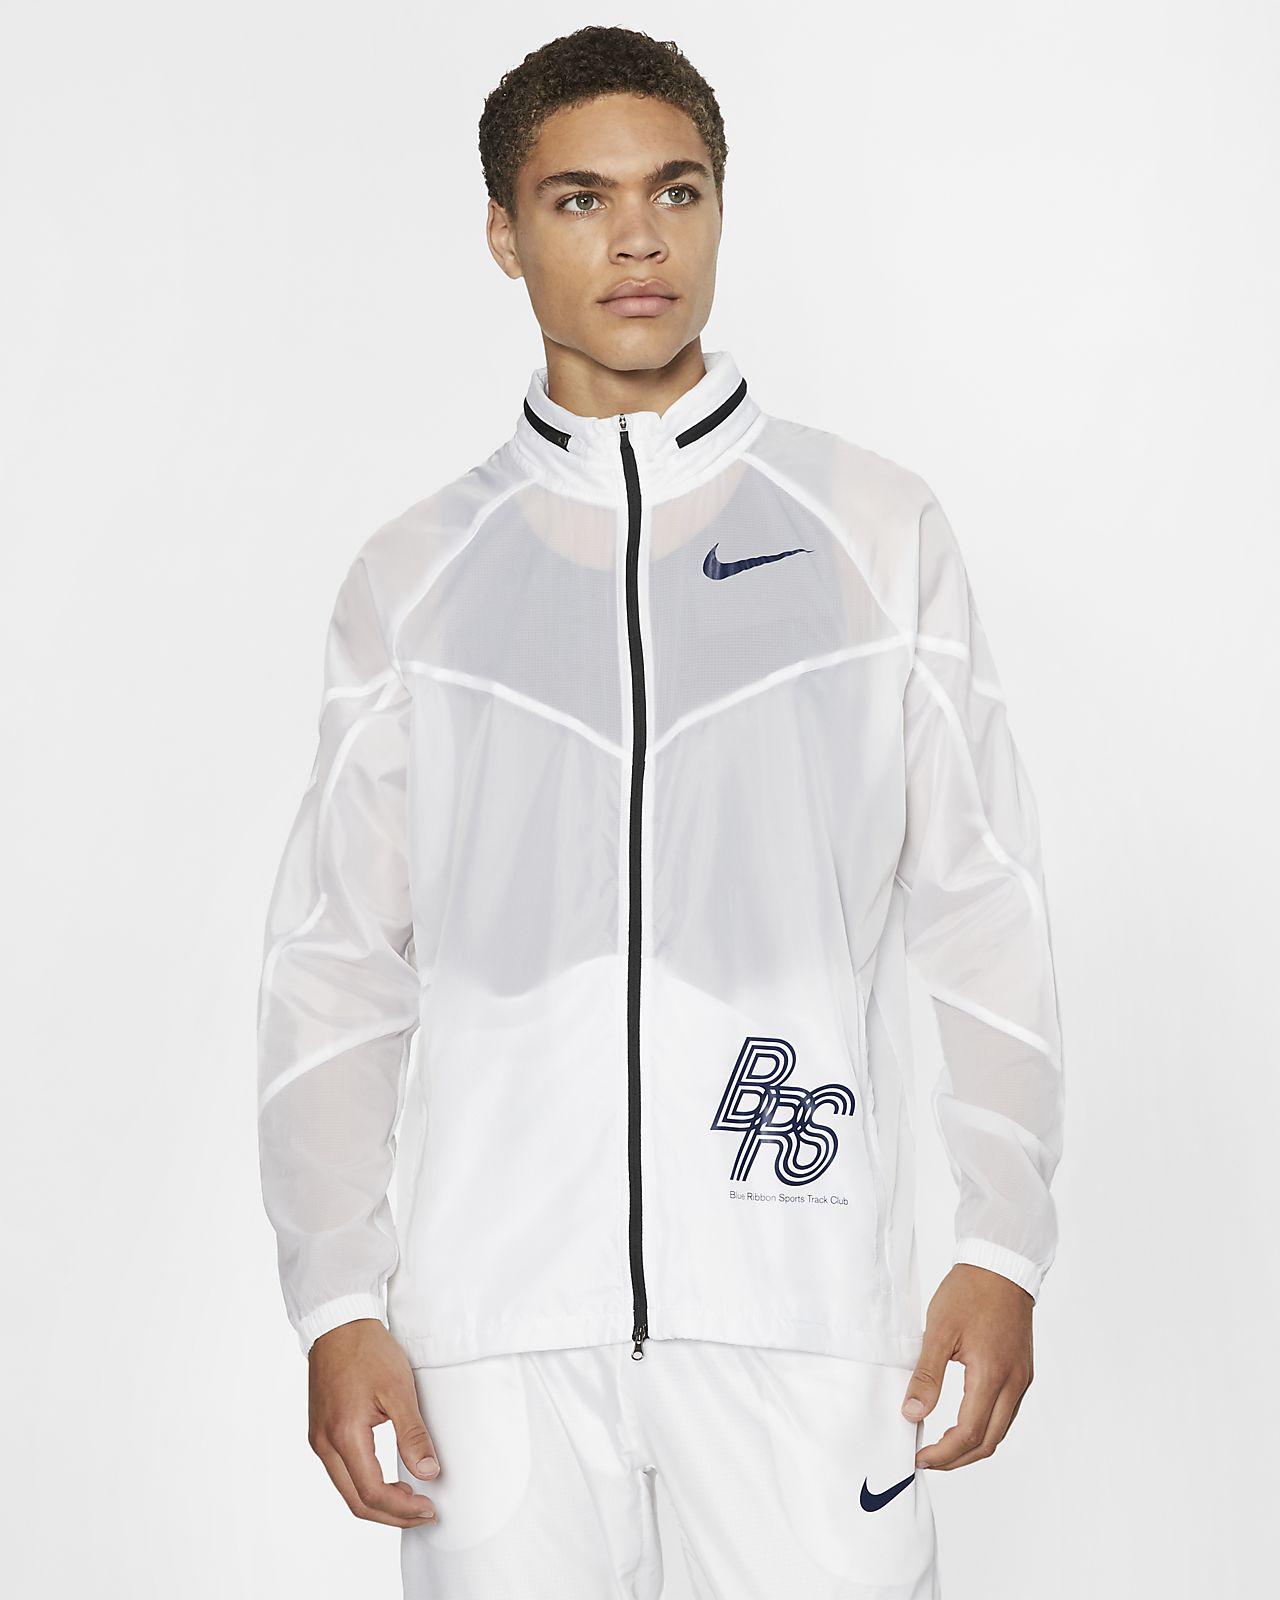 Беговая куртка Nike BRS